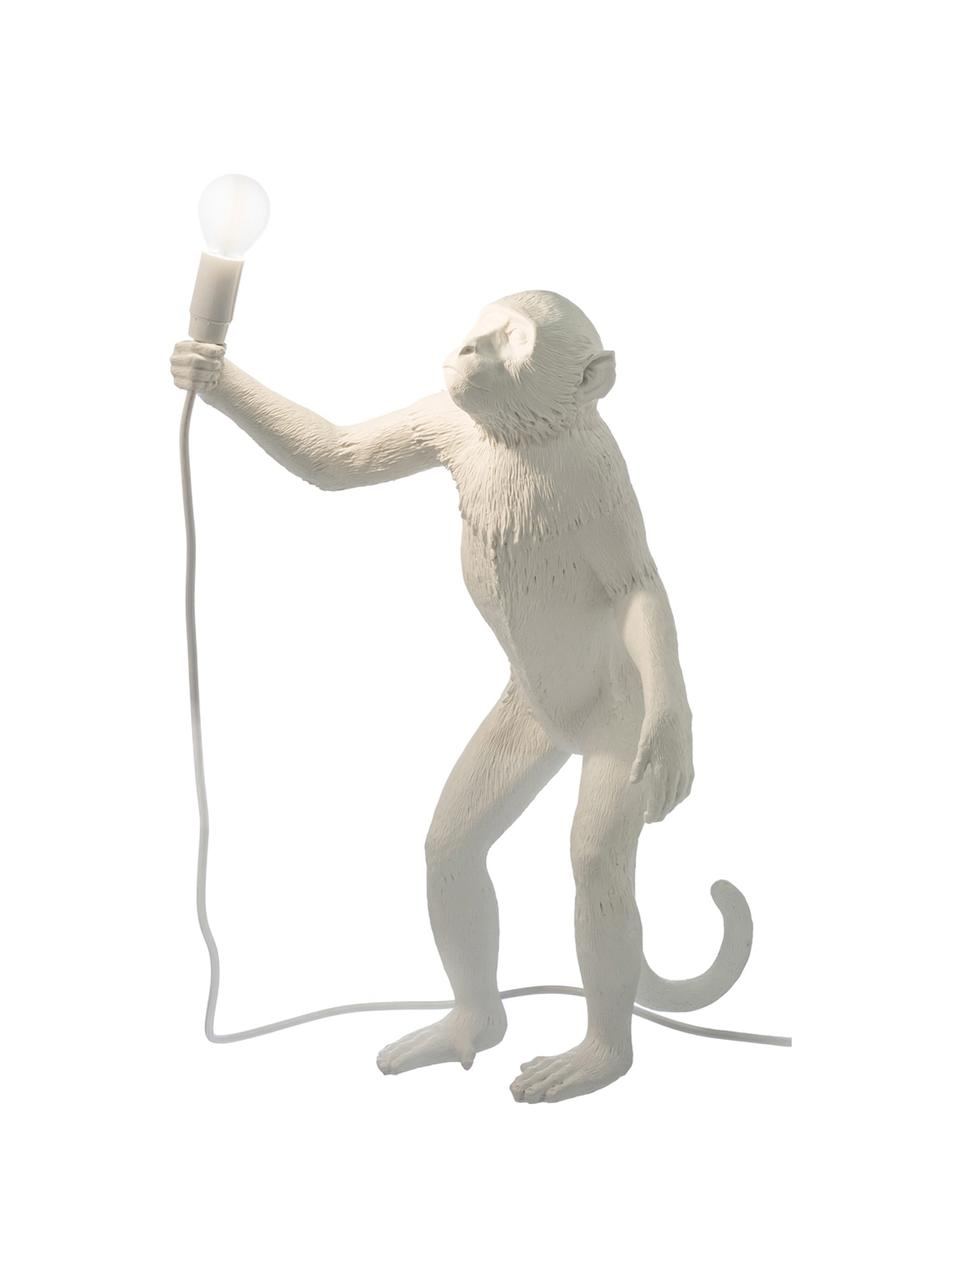 Lampada da tavolo da esterno con spina Monkey, Lampada: resina sintetica, Bianco, Larg. 46 x Alt. 54 cm